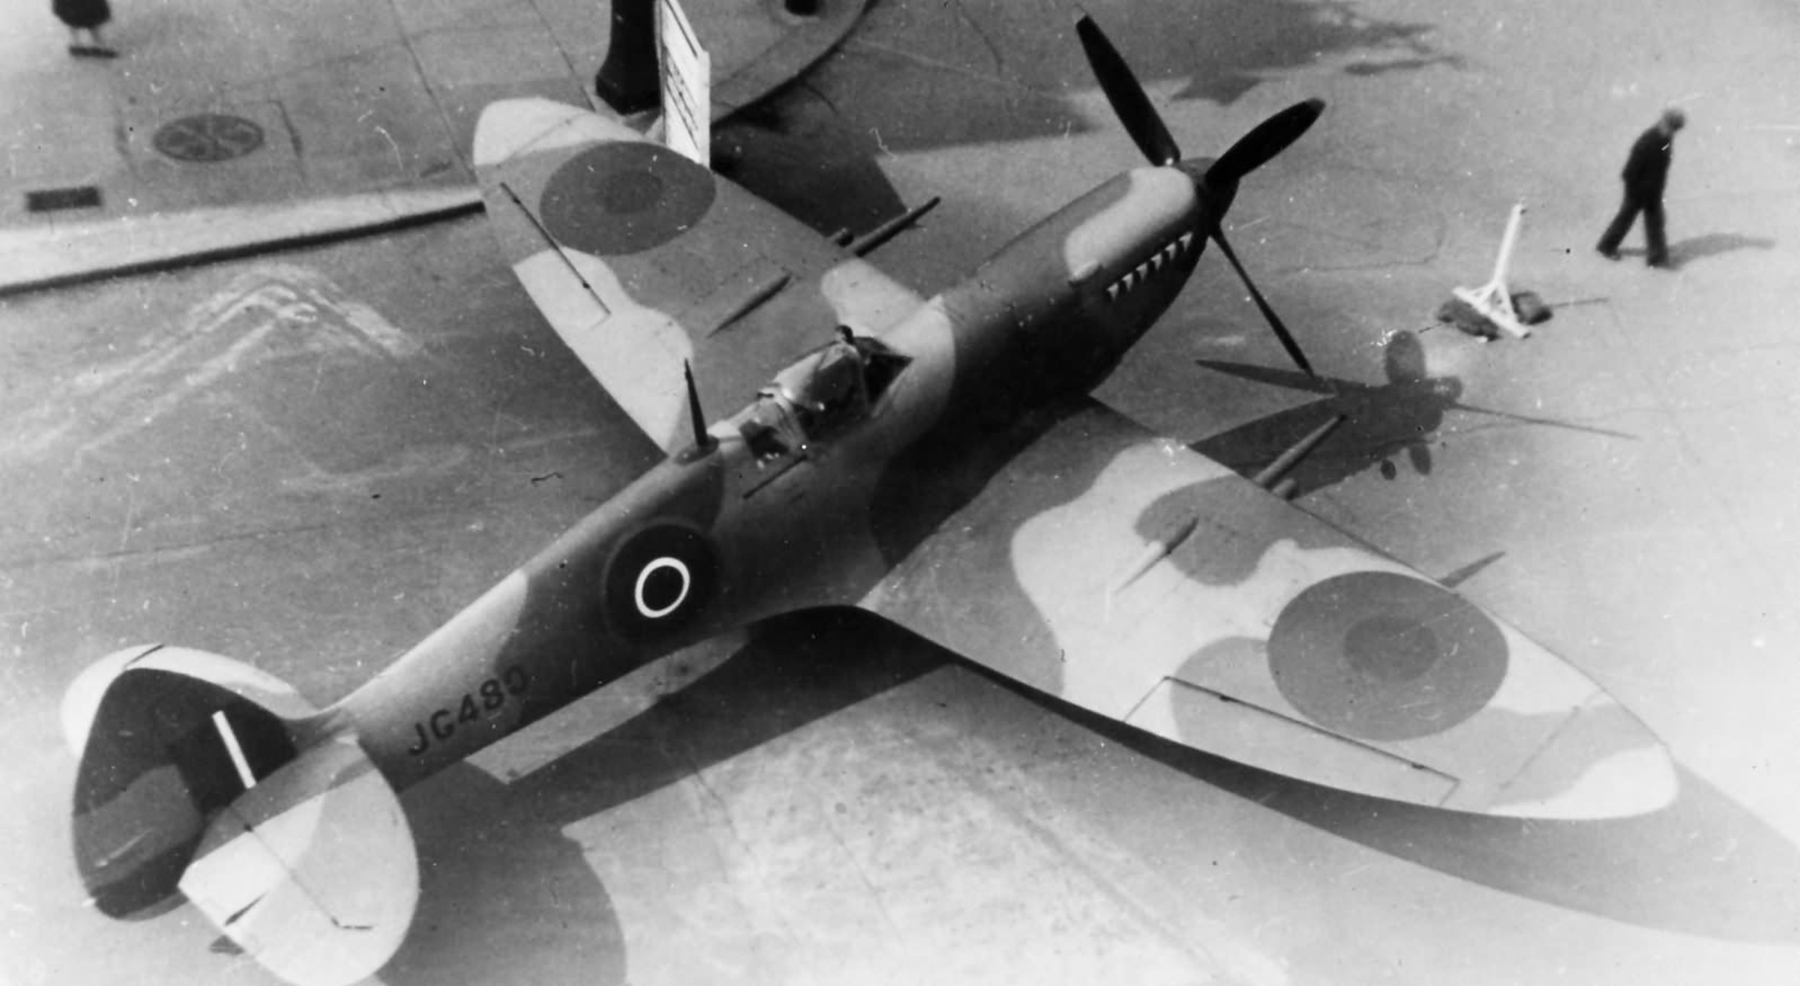 Factory fresh Spitfire MkVIII RAF JG480 viewed from above web 01